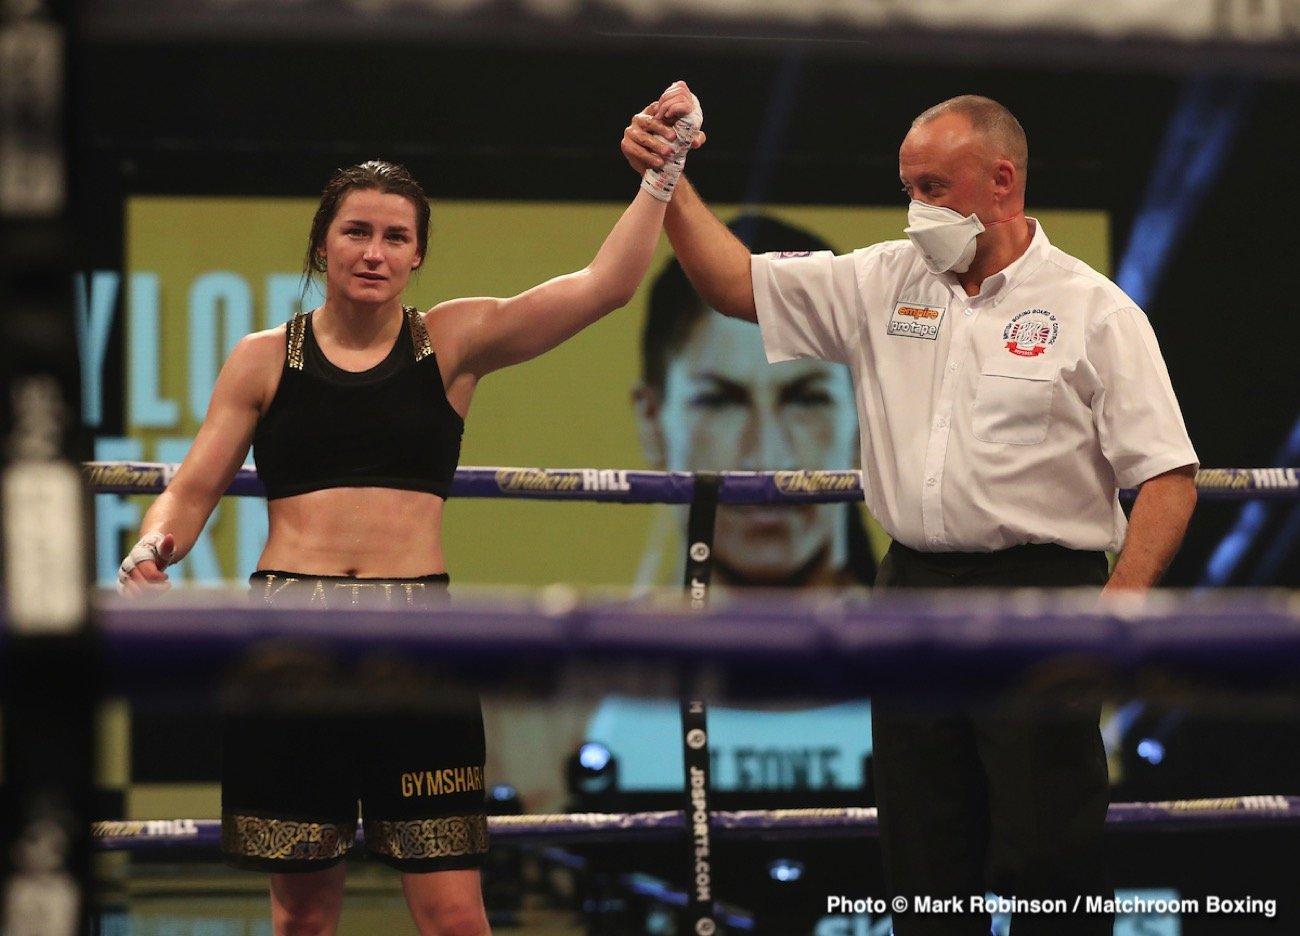 Katie Taylor, Miriam Gutiérrez - Katie Taylor's masterful Undisputed Lightweight World Title defense against Miriam Gutierrez at The SSE Arena, Wembley drew more than 2 million views across the United Kingdom and Ireland.